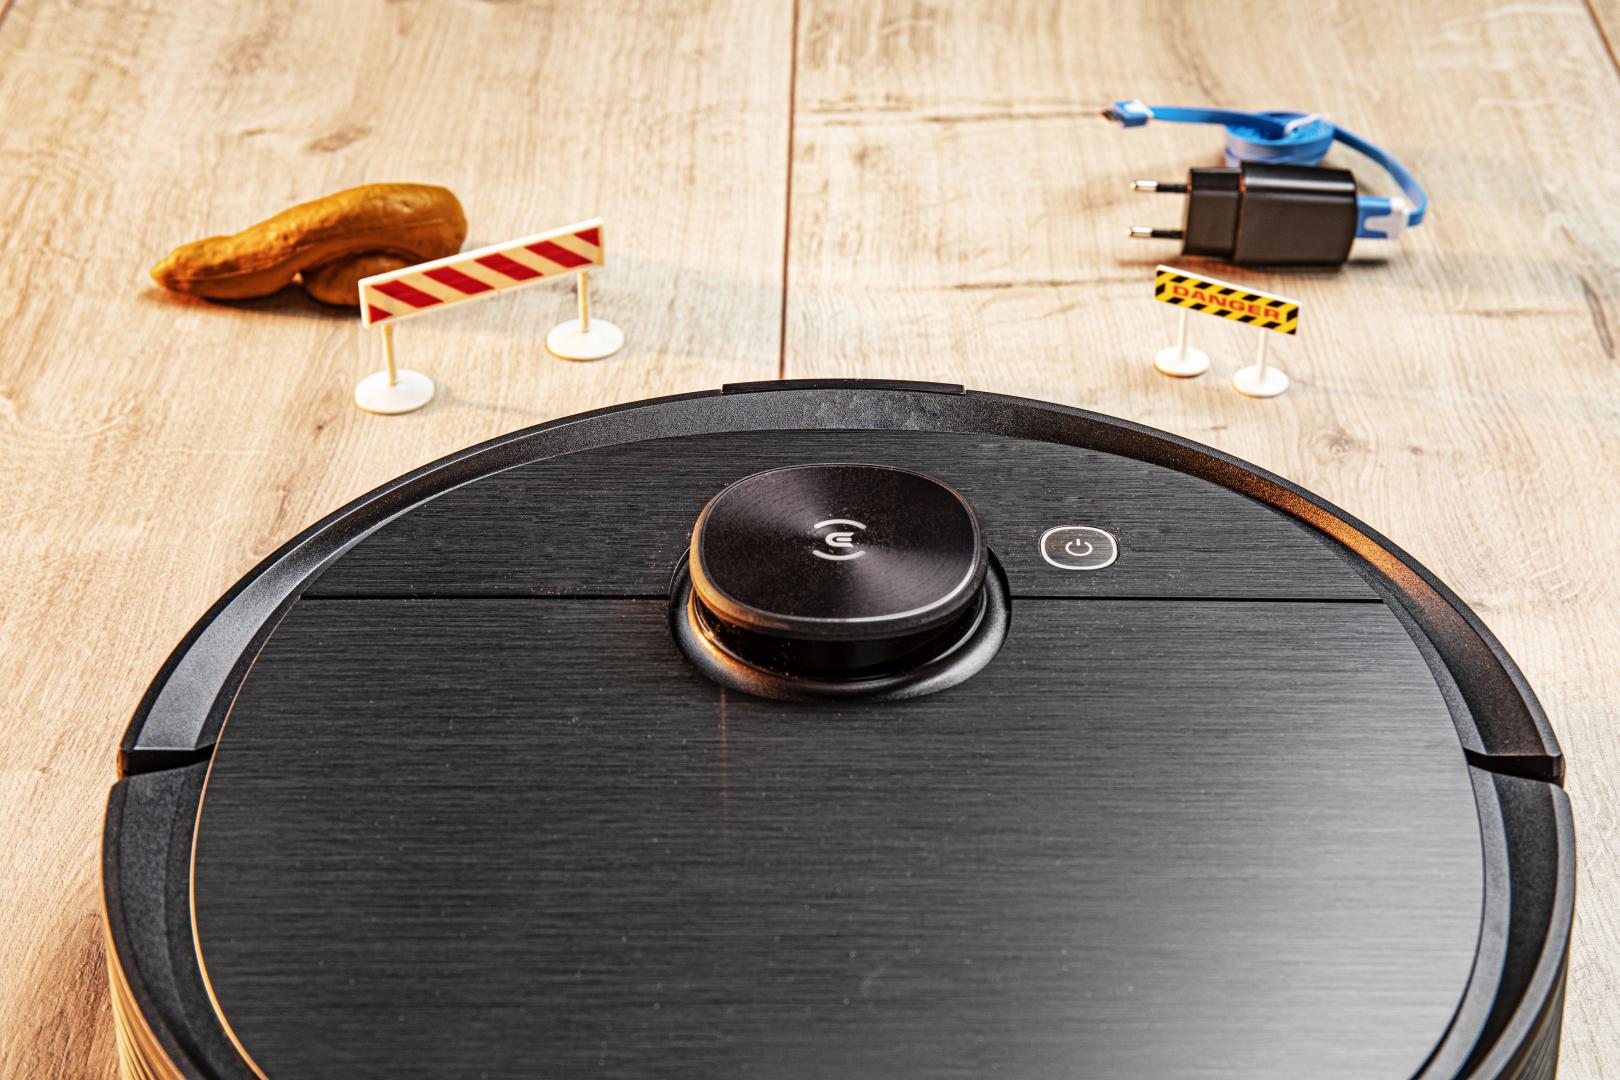 slimme stofzuigrobot camera herkenning privacy praktijk test review